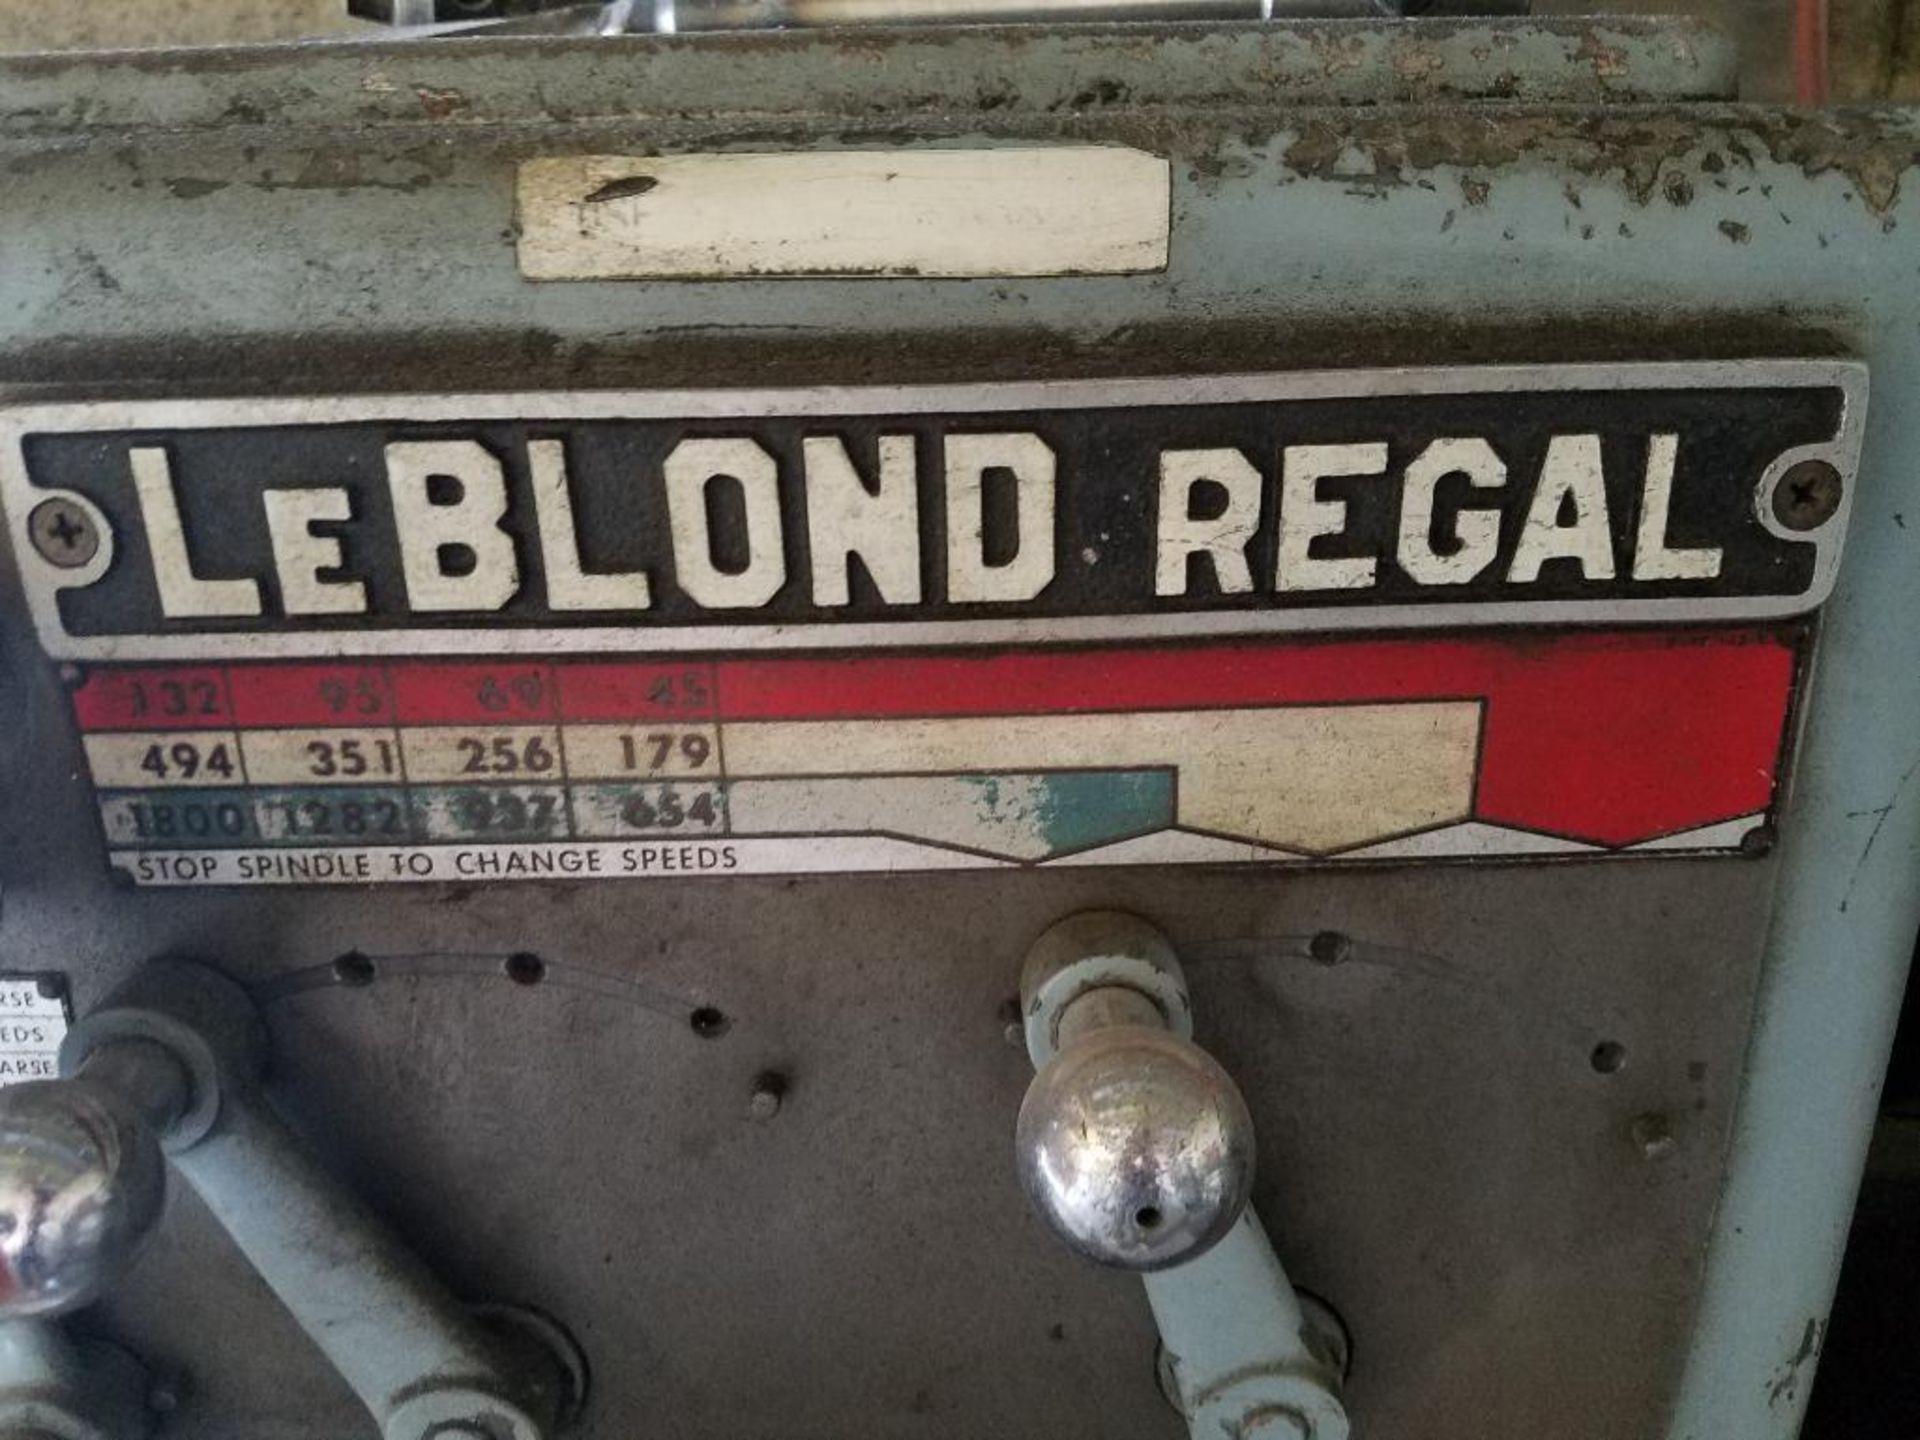 LeBlond Regal lathe - Image 2 of 10